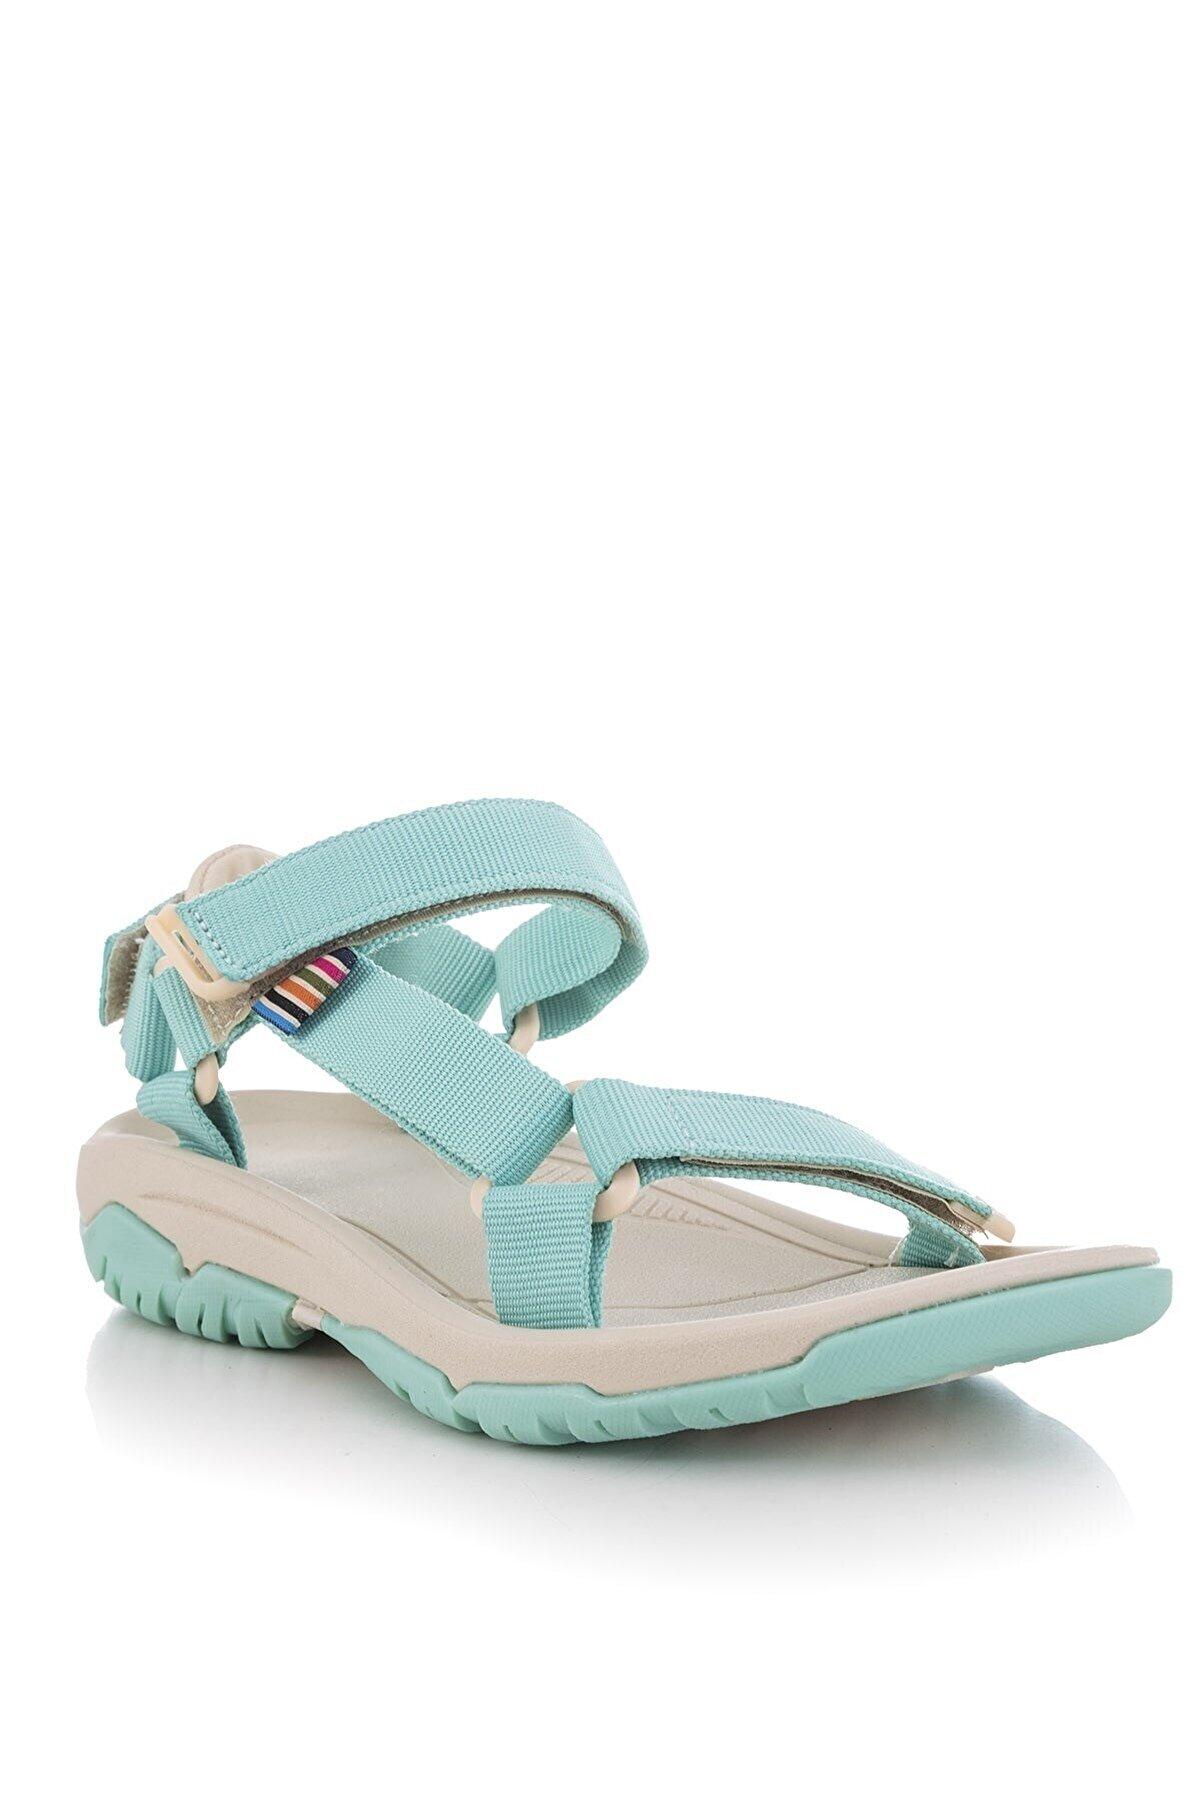 Beyond  Kadın Mint Step Cırtlı Trekking Sandalet